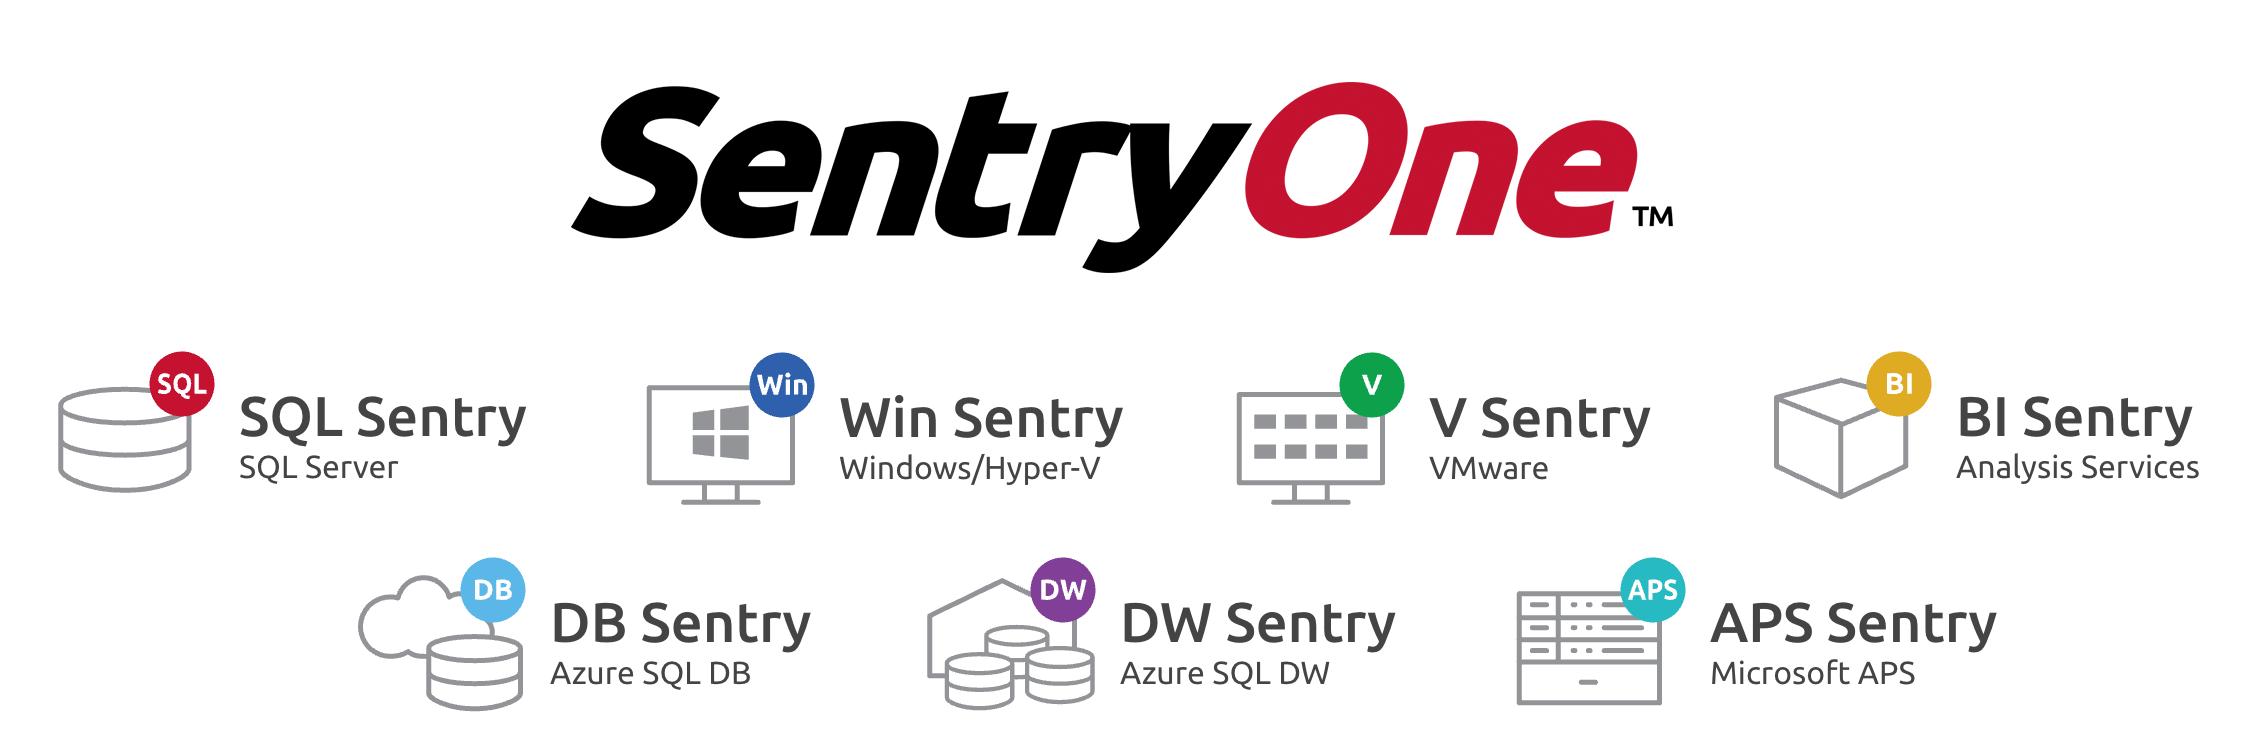 SentryOne lineup